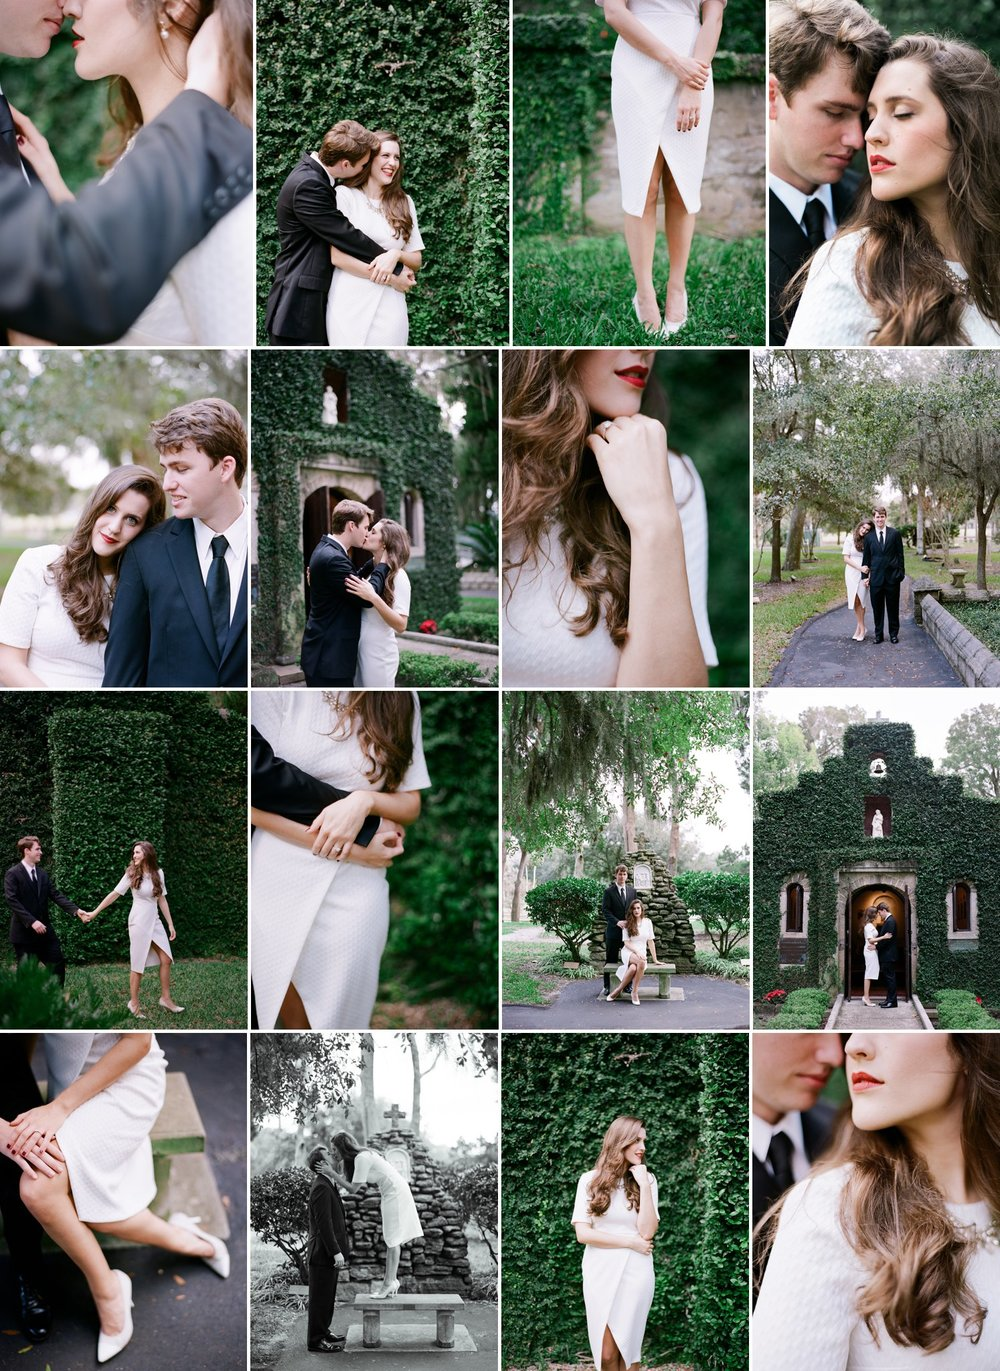 st augustine wedding photographer shannon griffin photography_0008.jpg